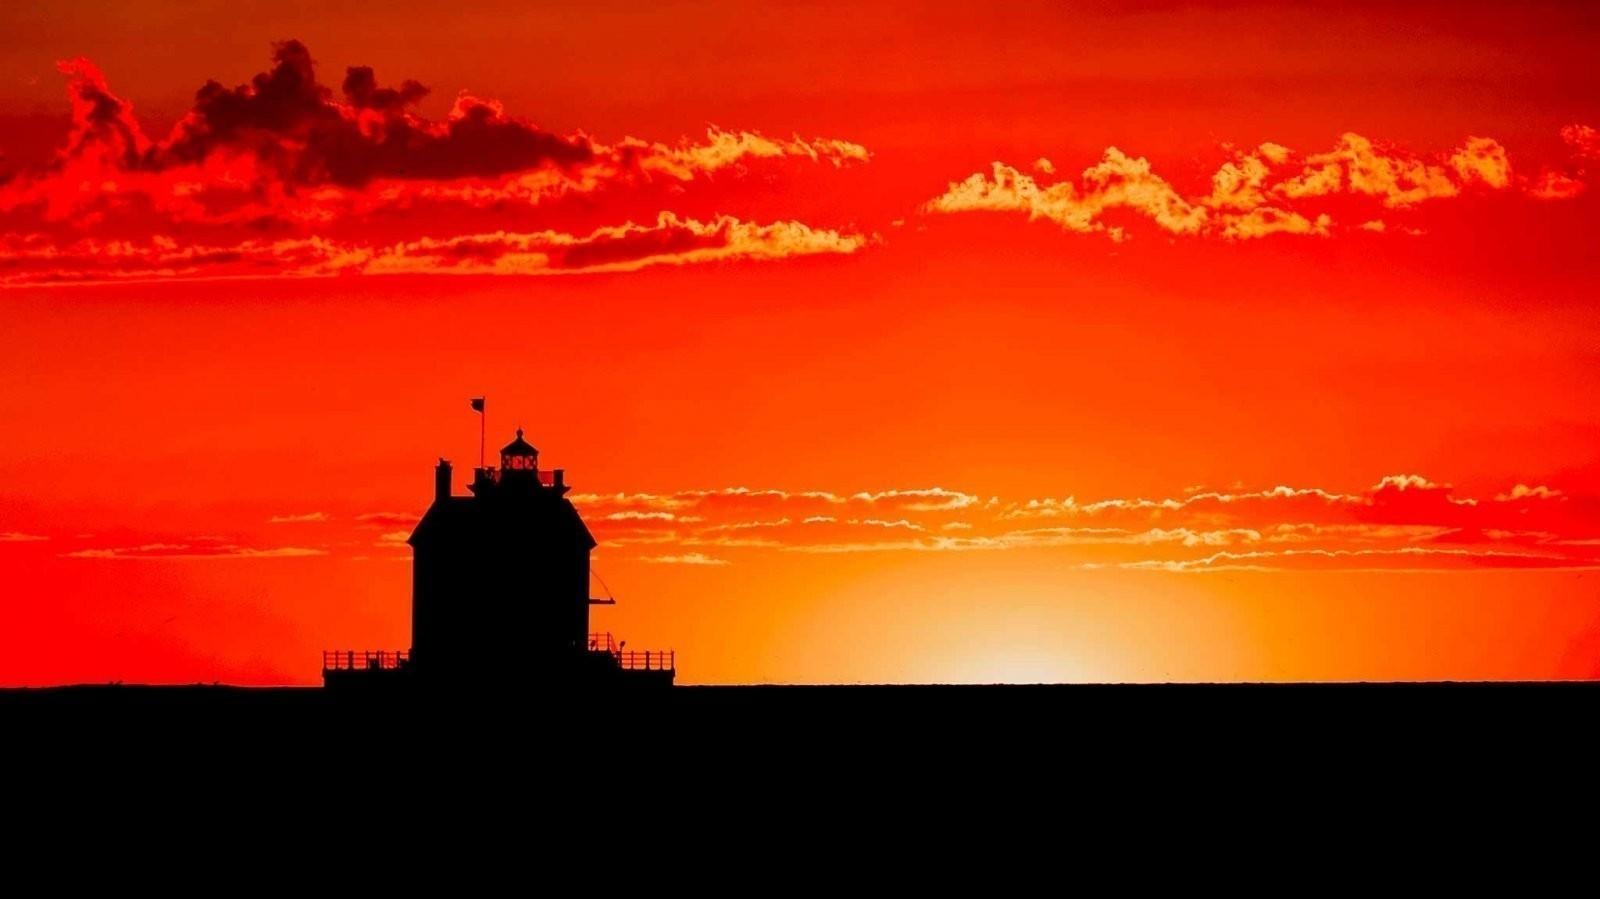 20150803_204403 - 0019 - Lorain Lighthouse Sunset.jpg